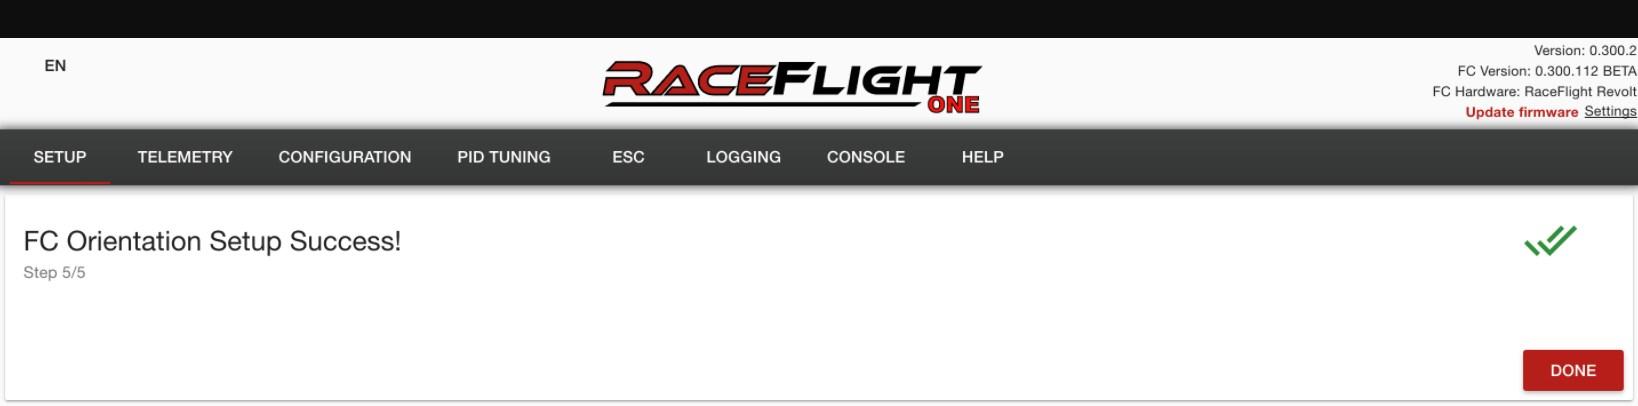 RaceFlight FC Orientation